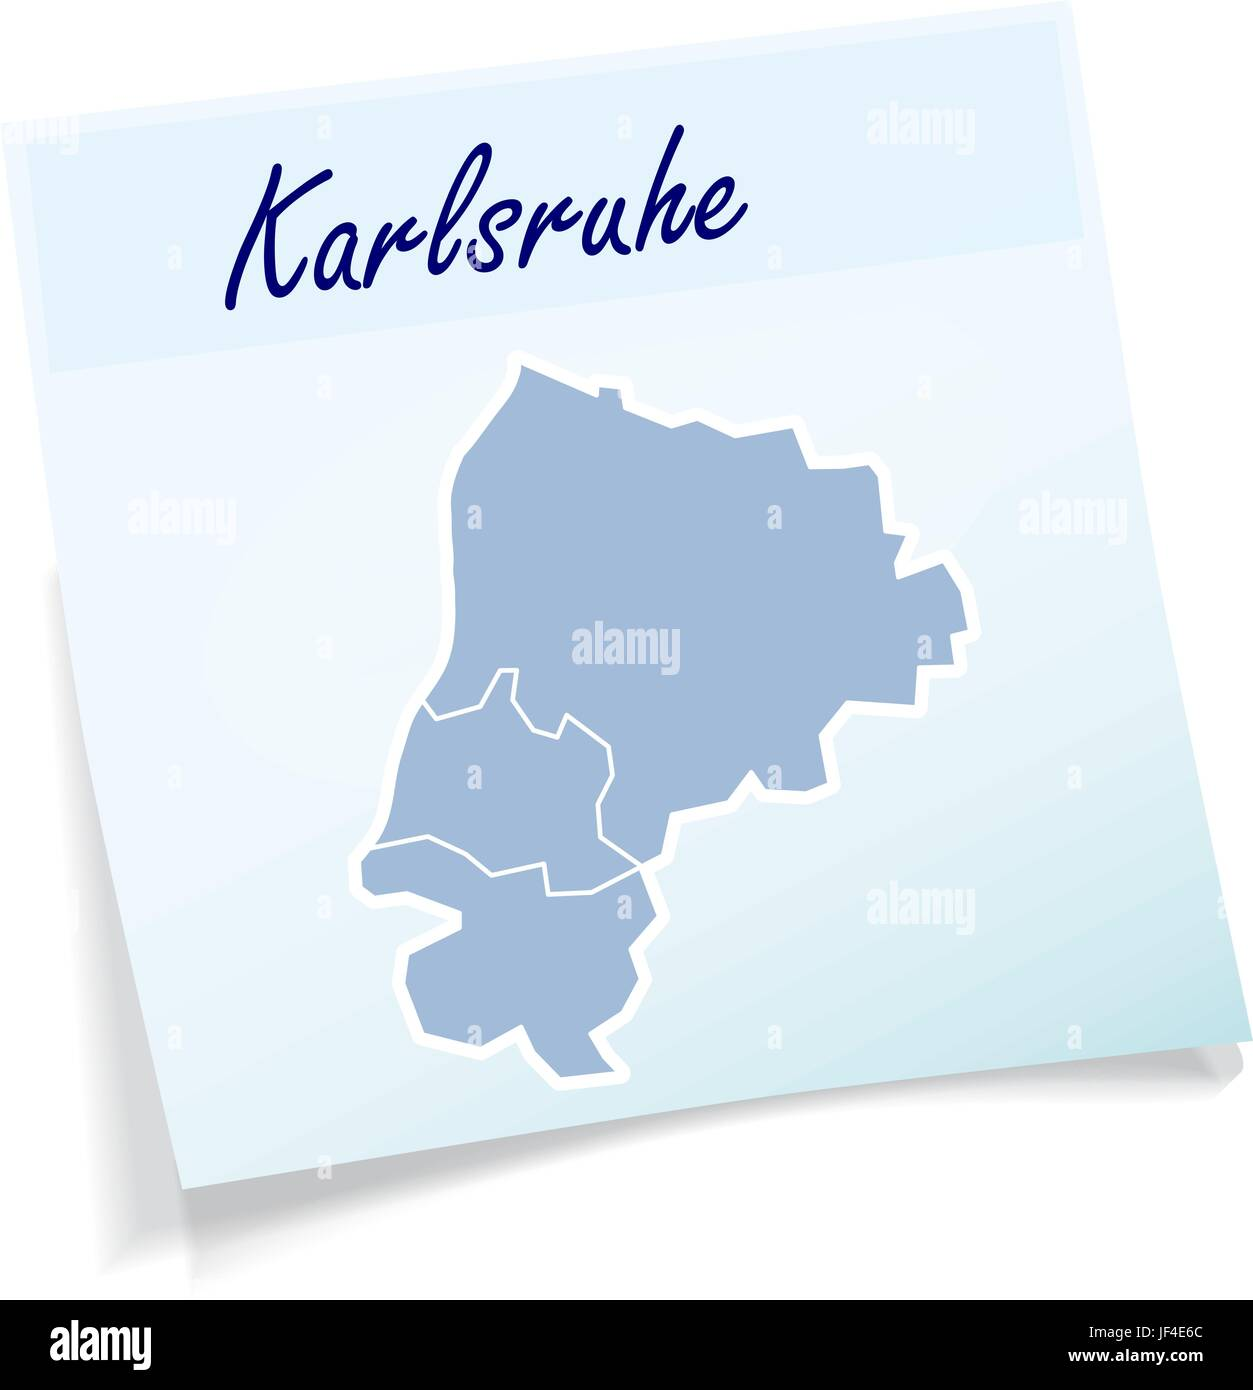 karlsruhe notes Stock Vector